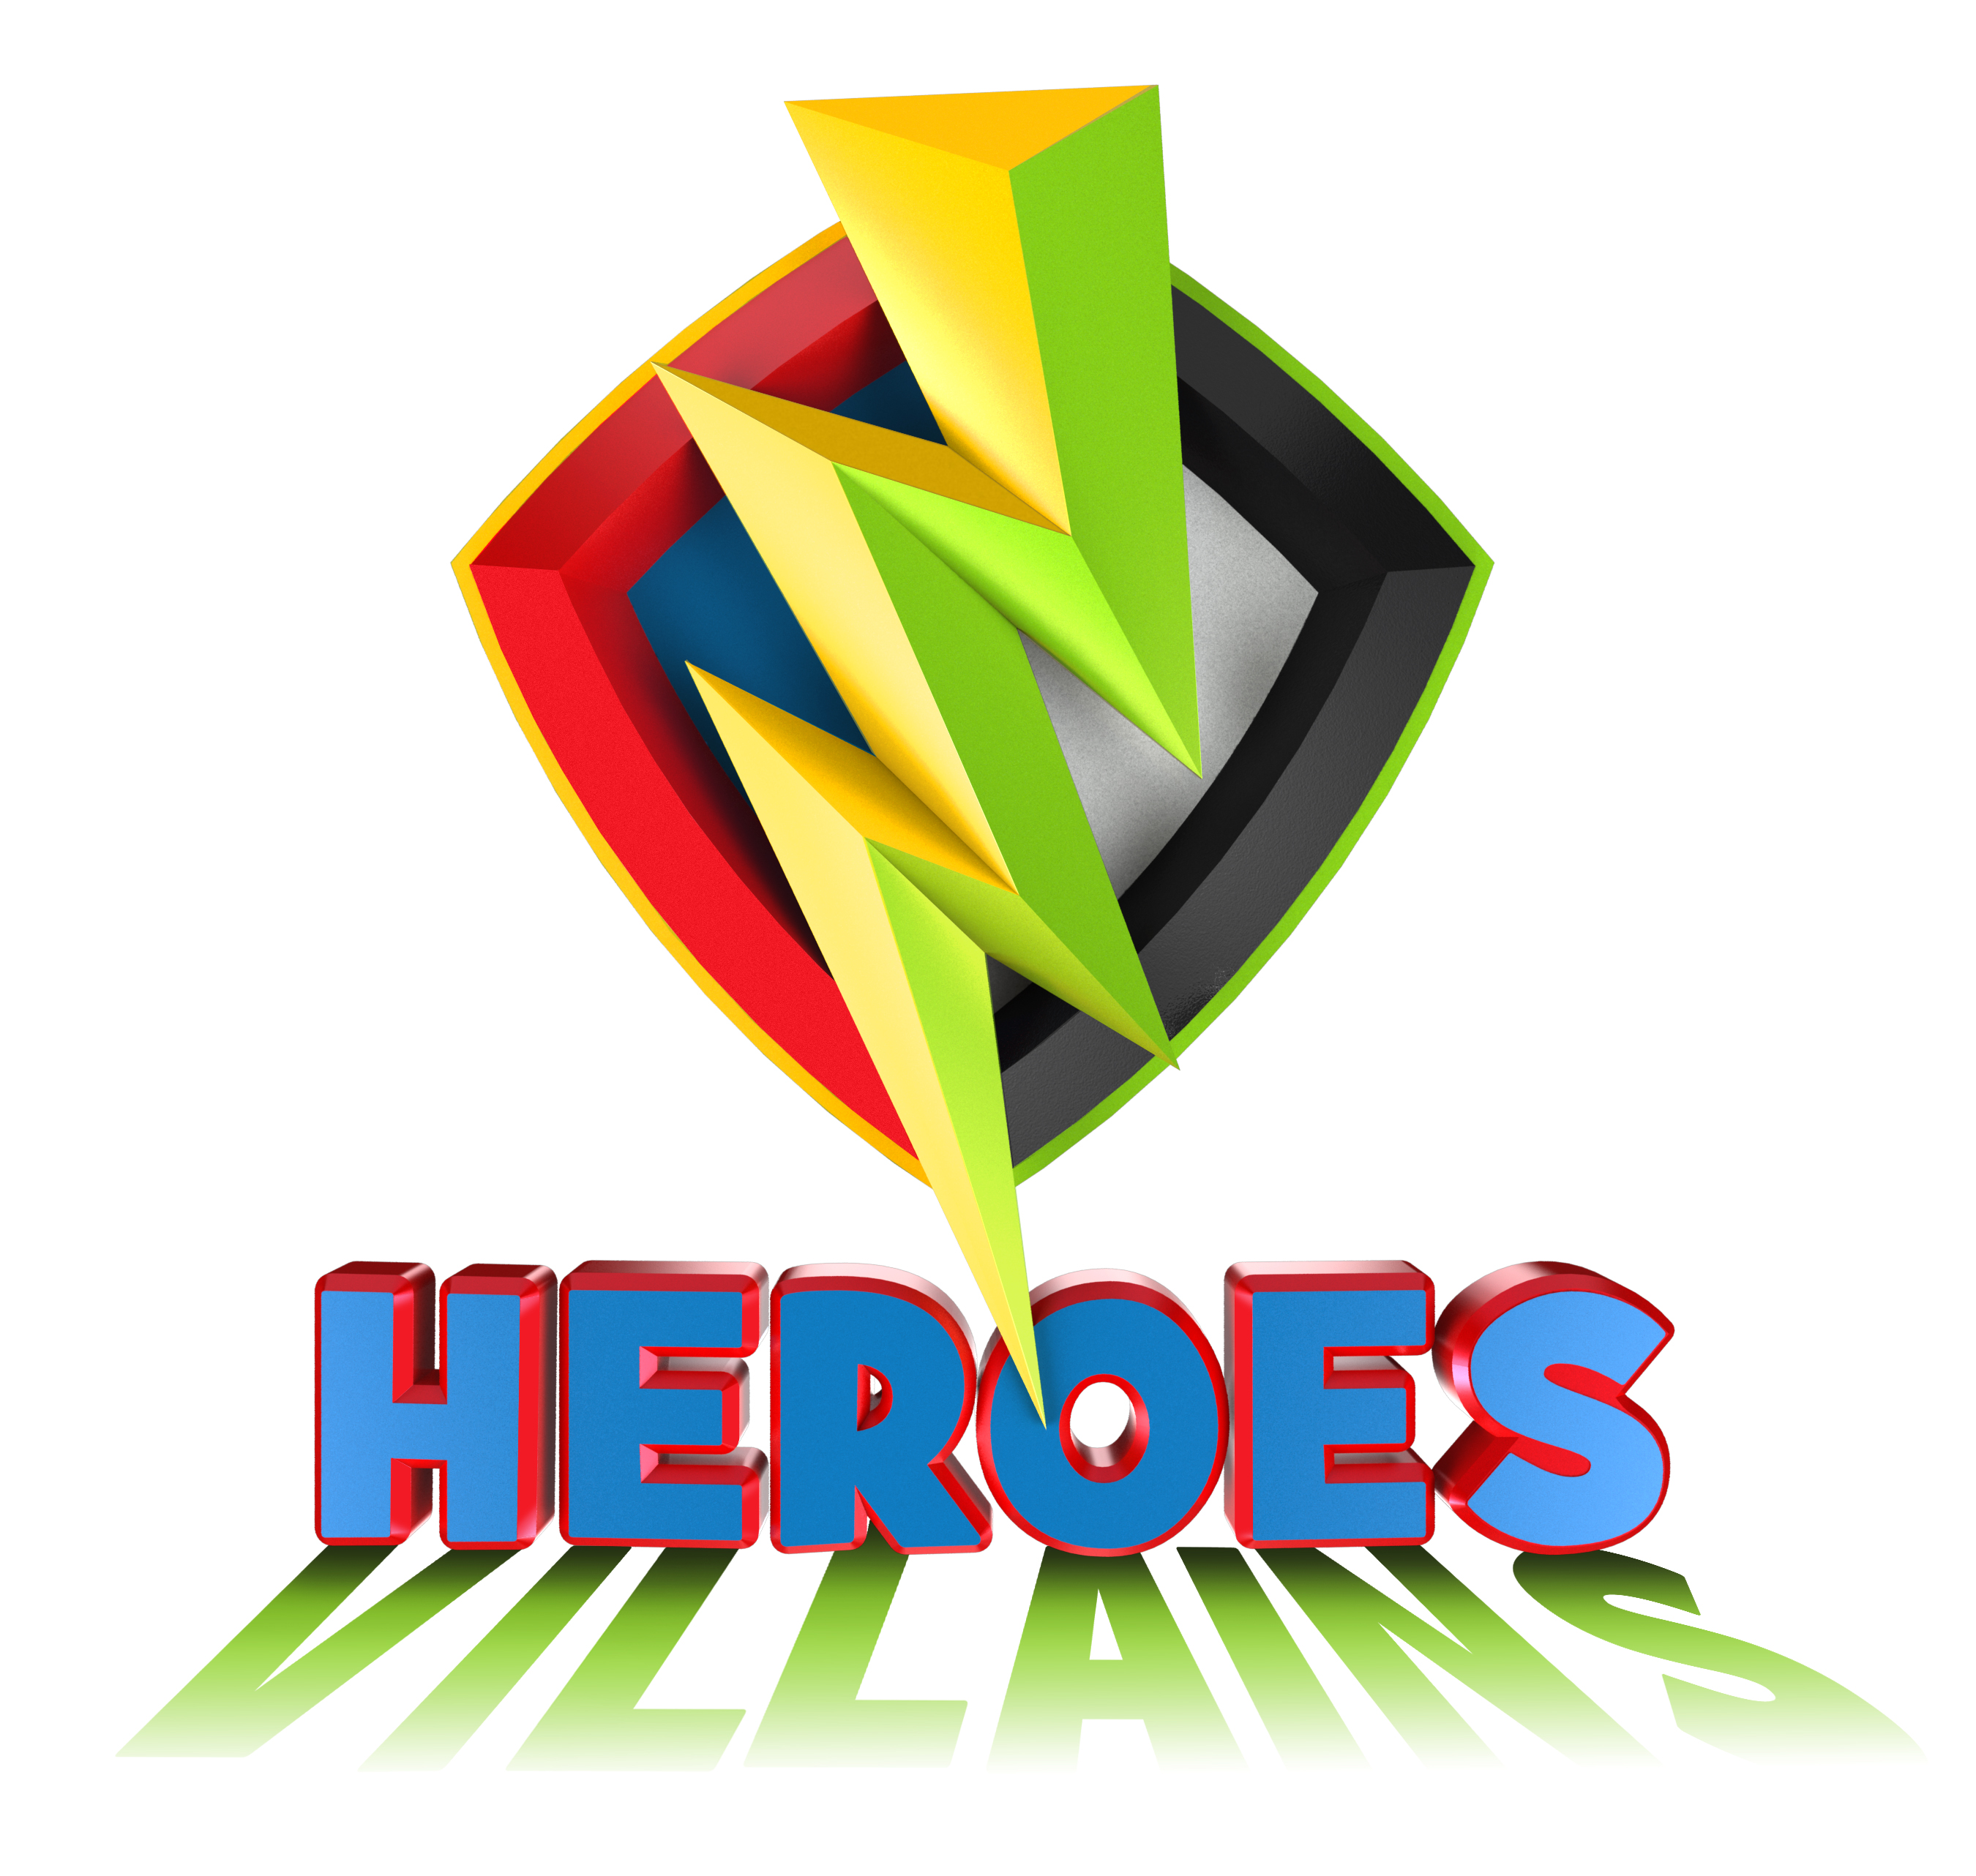 Logo 1 (JPG)